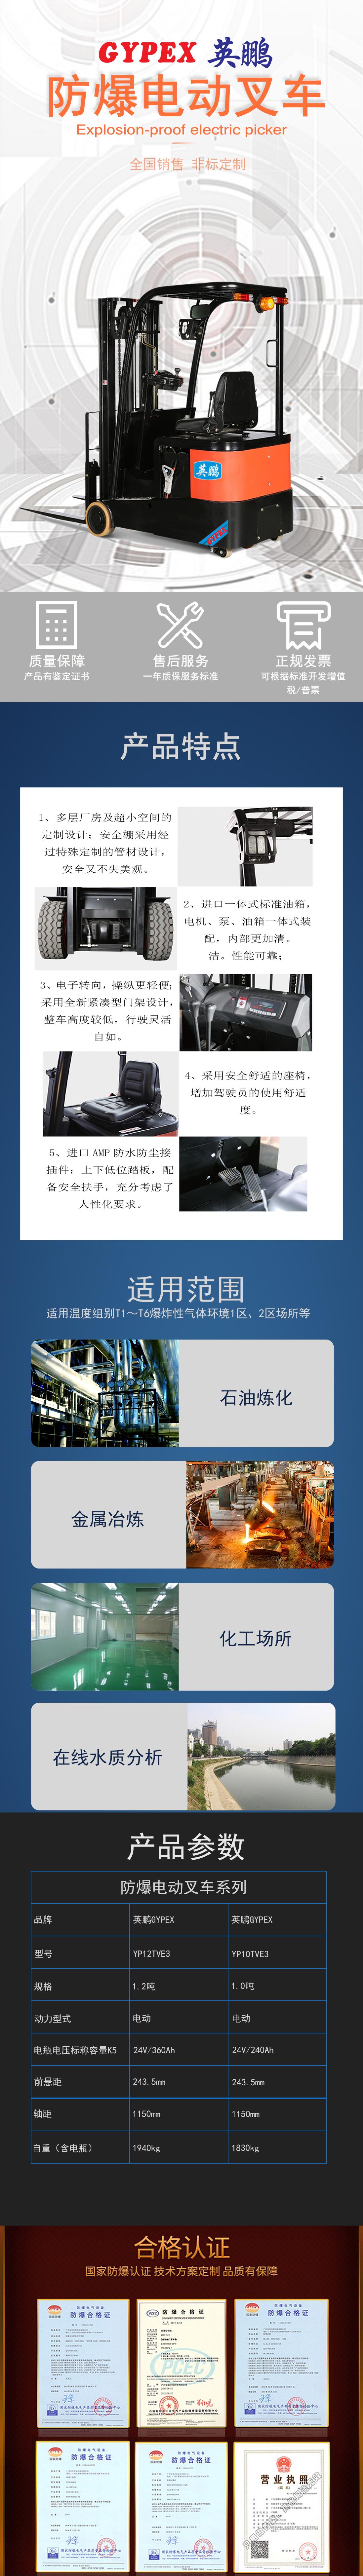 YP10 12 TVE3前移動式防爆電動叉車詳情圖.jpg